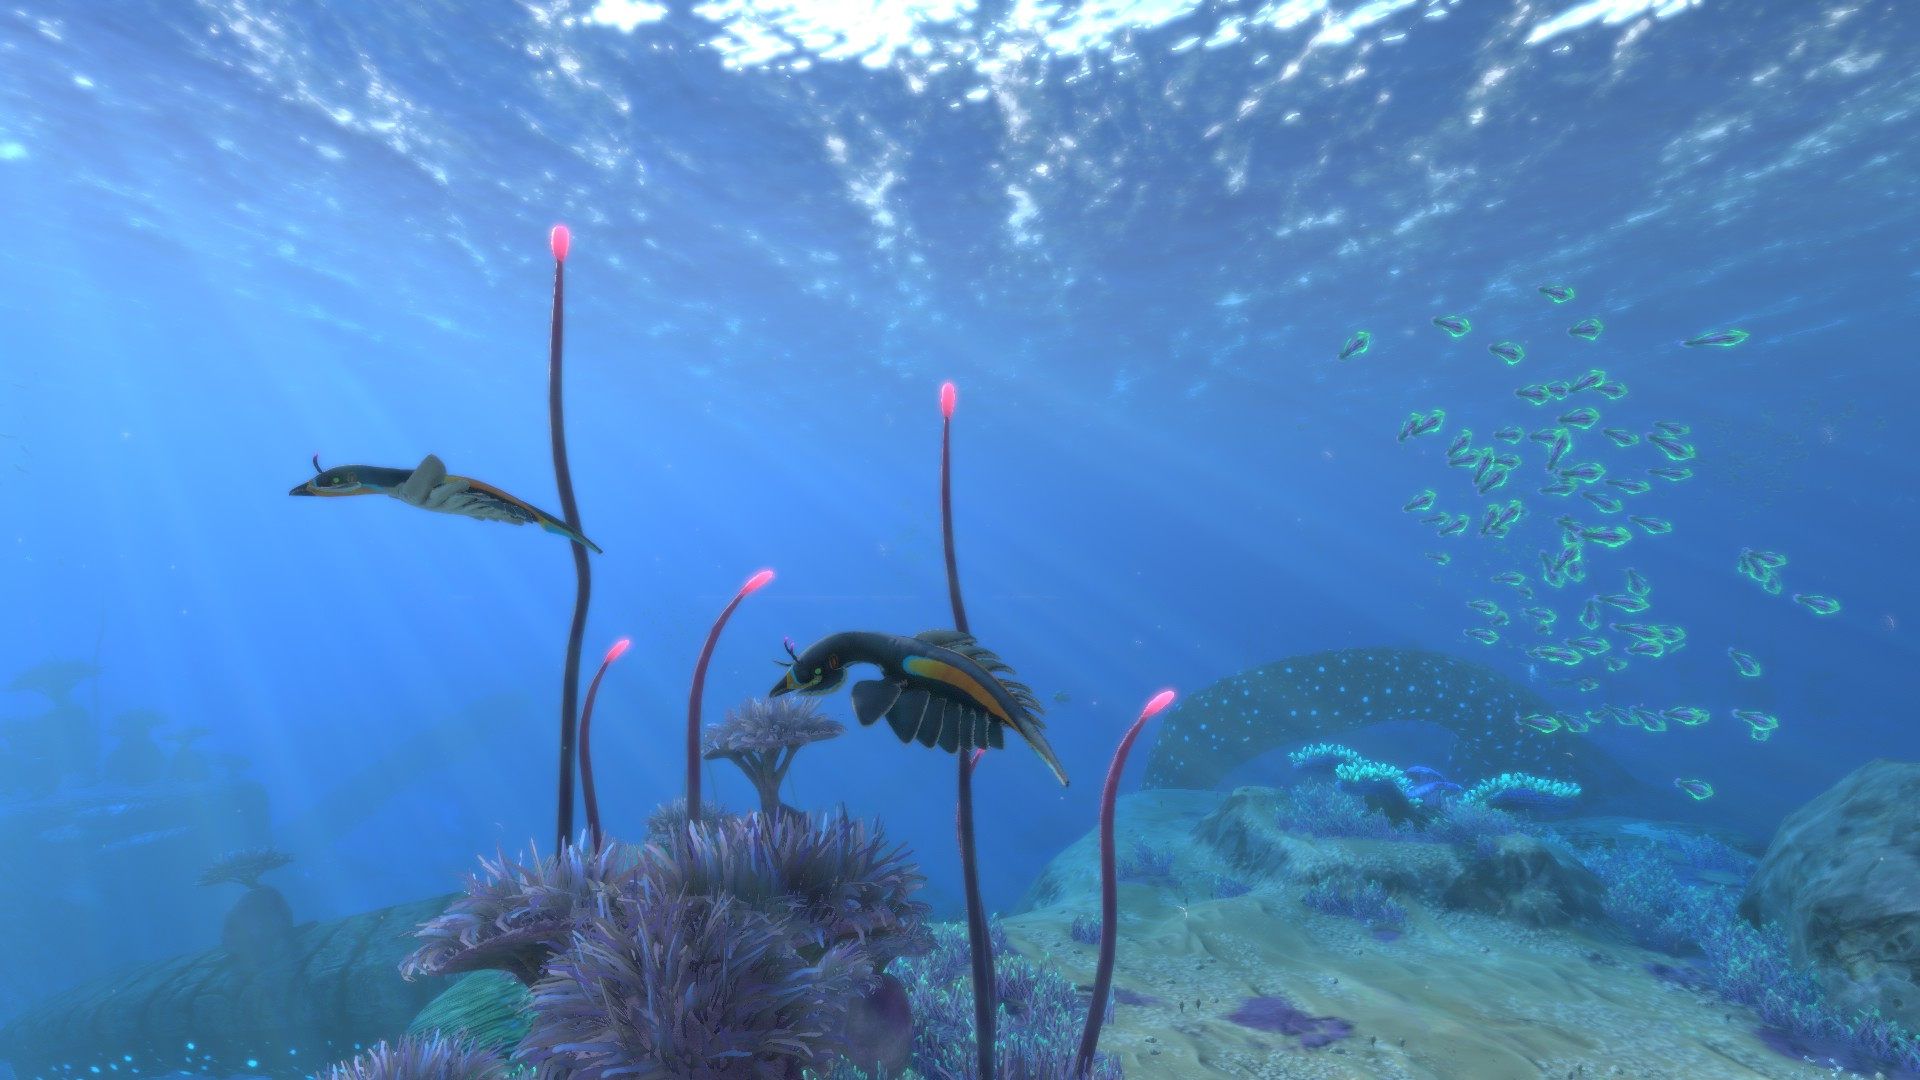 Steam Community :: Guide :: Subnautica Below Zero: Flora